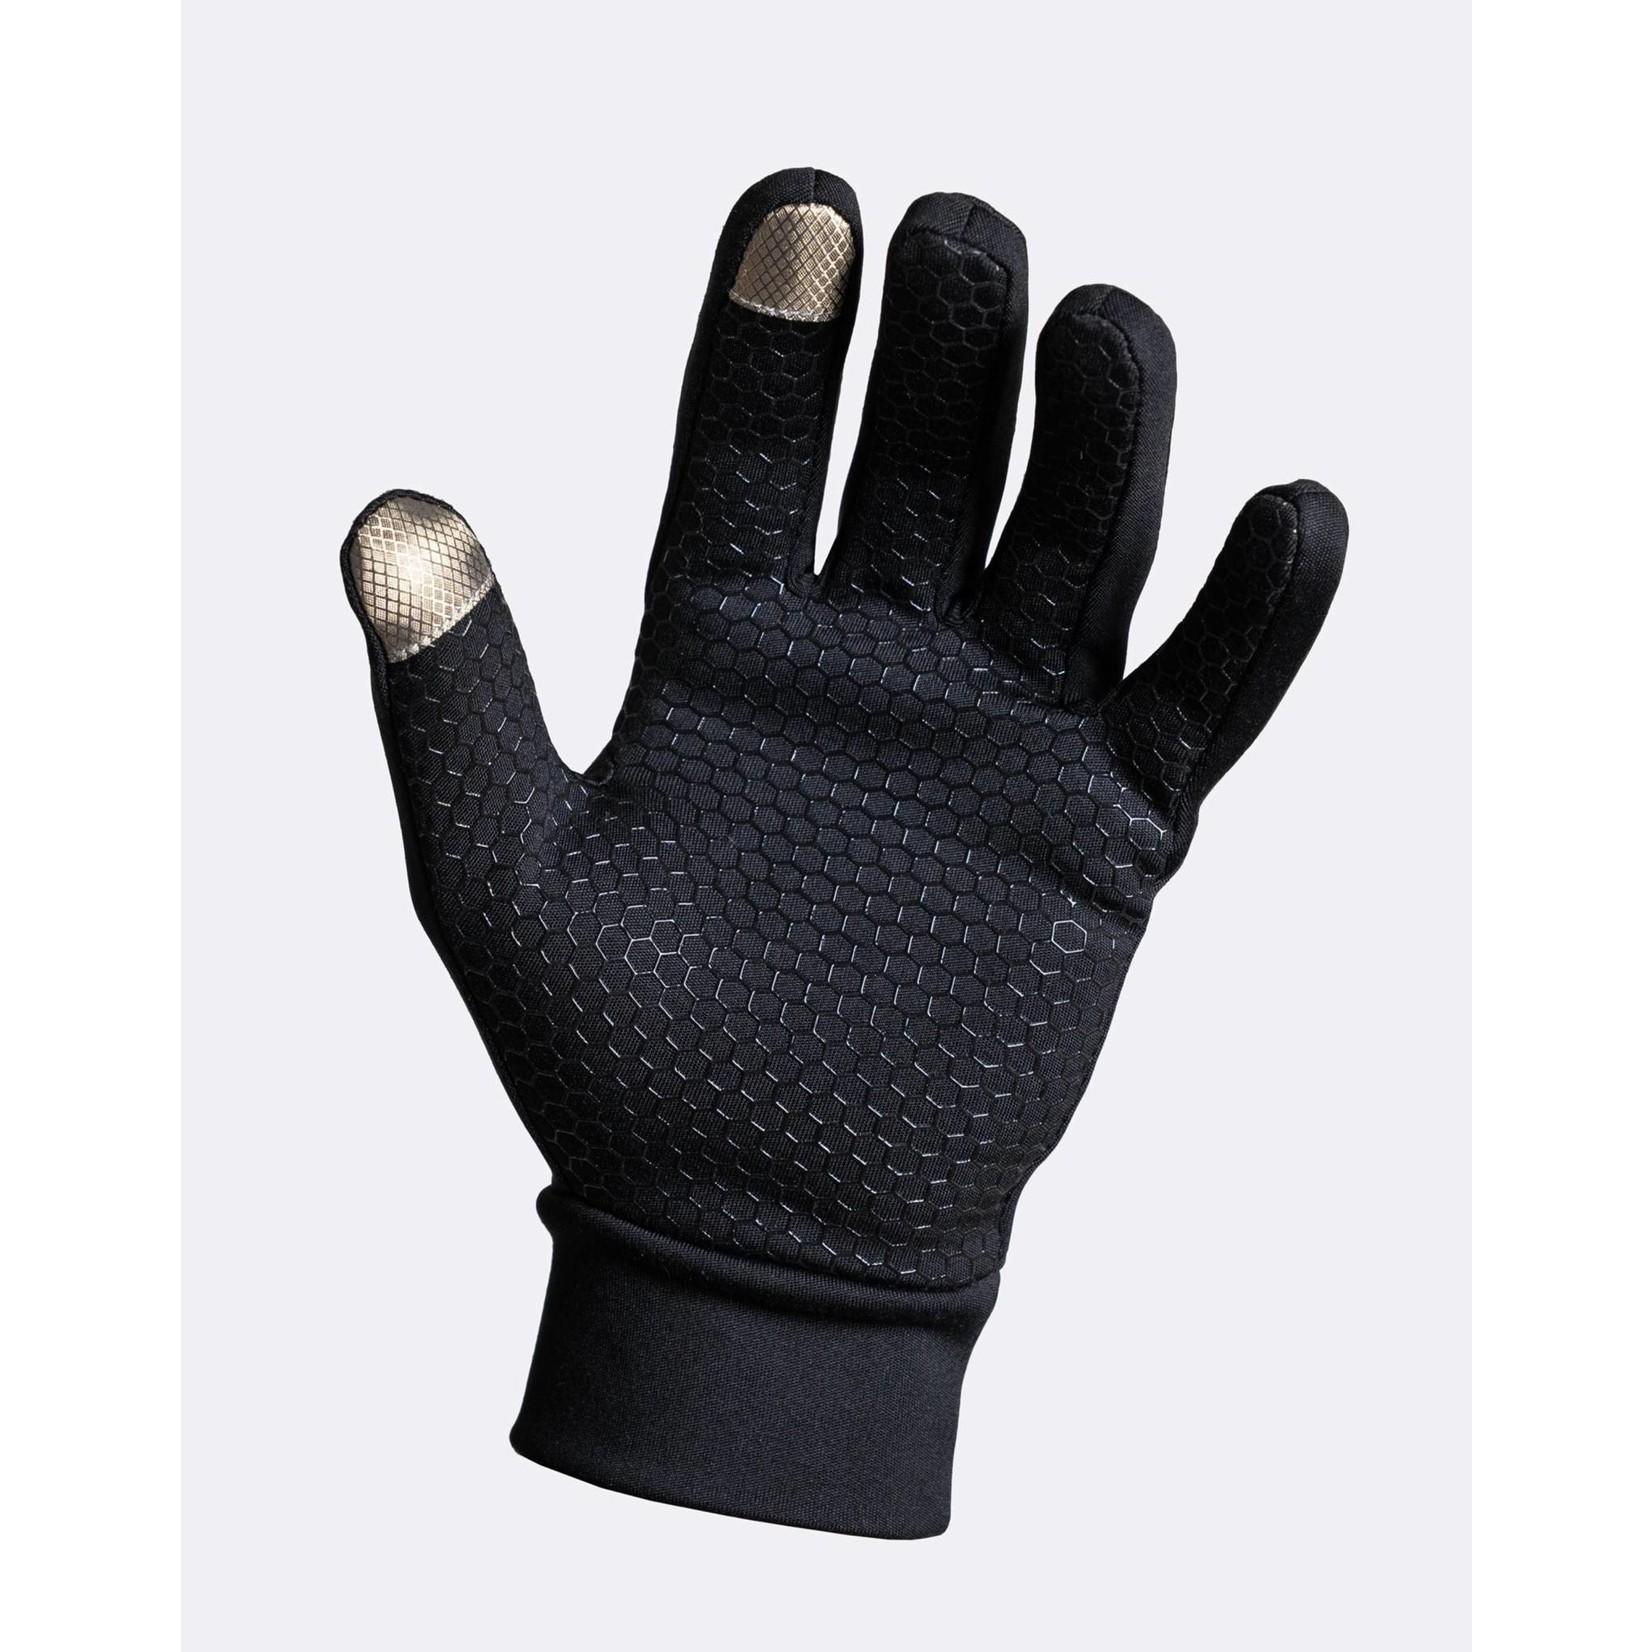 Pedal Mafia Stealth Thermal Glove Black